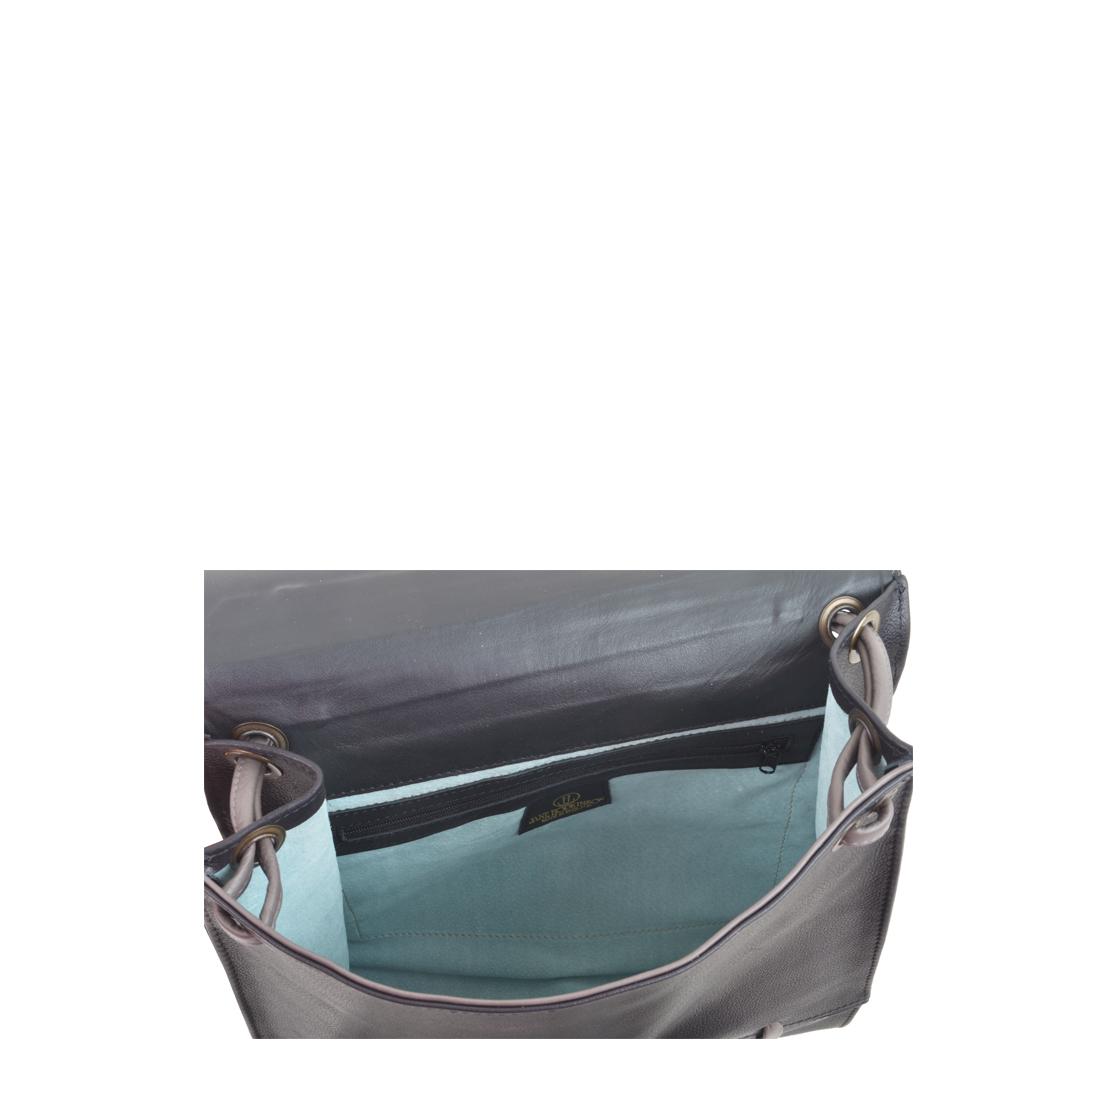 Elsa Black with grigio Leather Across Body Bag